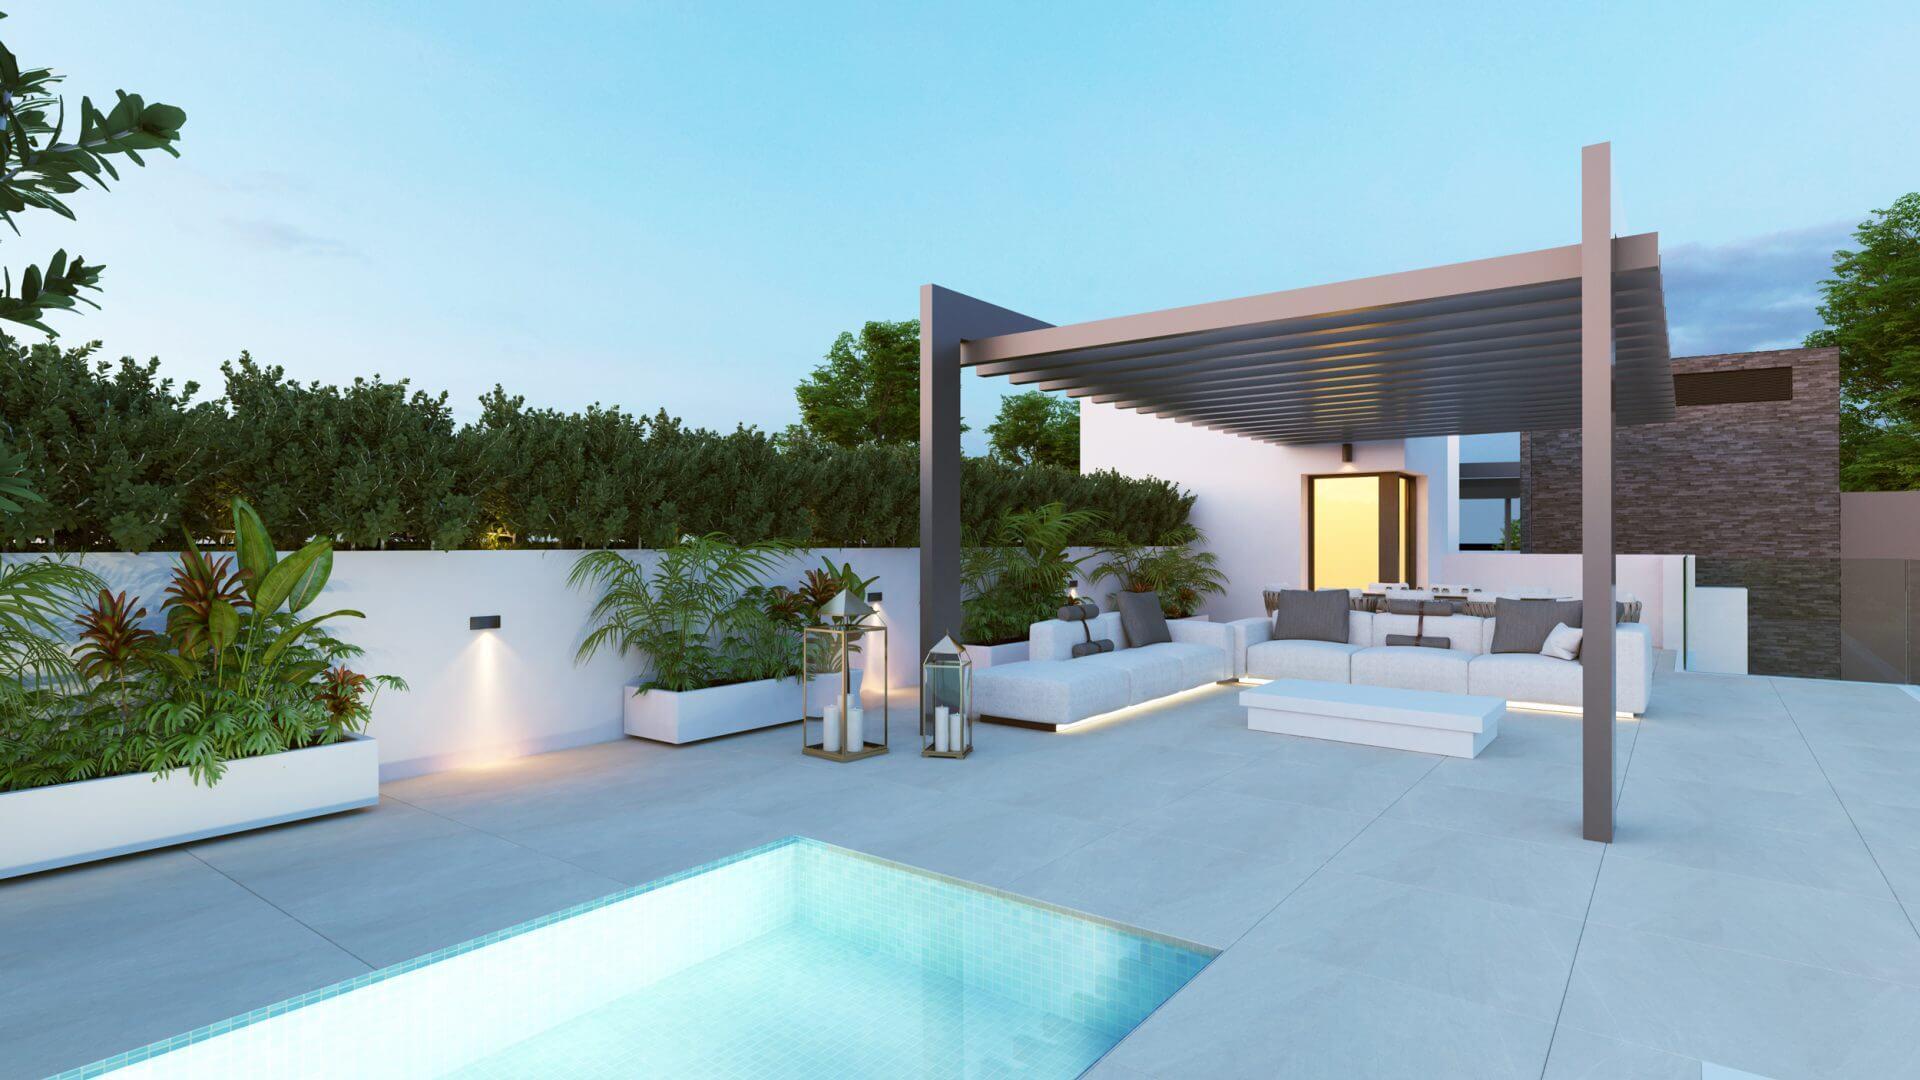 aqualina residences collection benahavis marbella costa del sol appartement penthouse te koop solarium